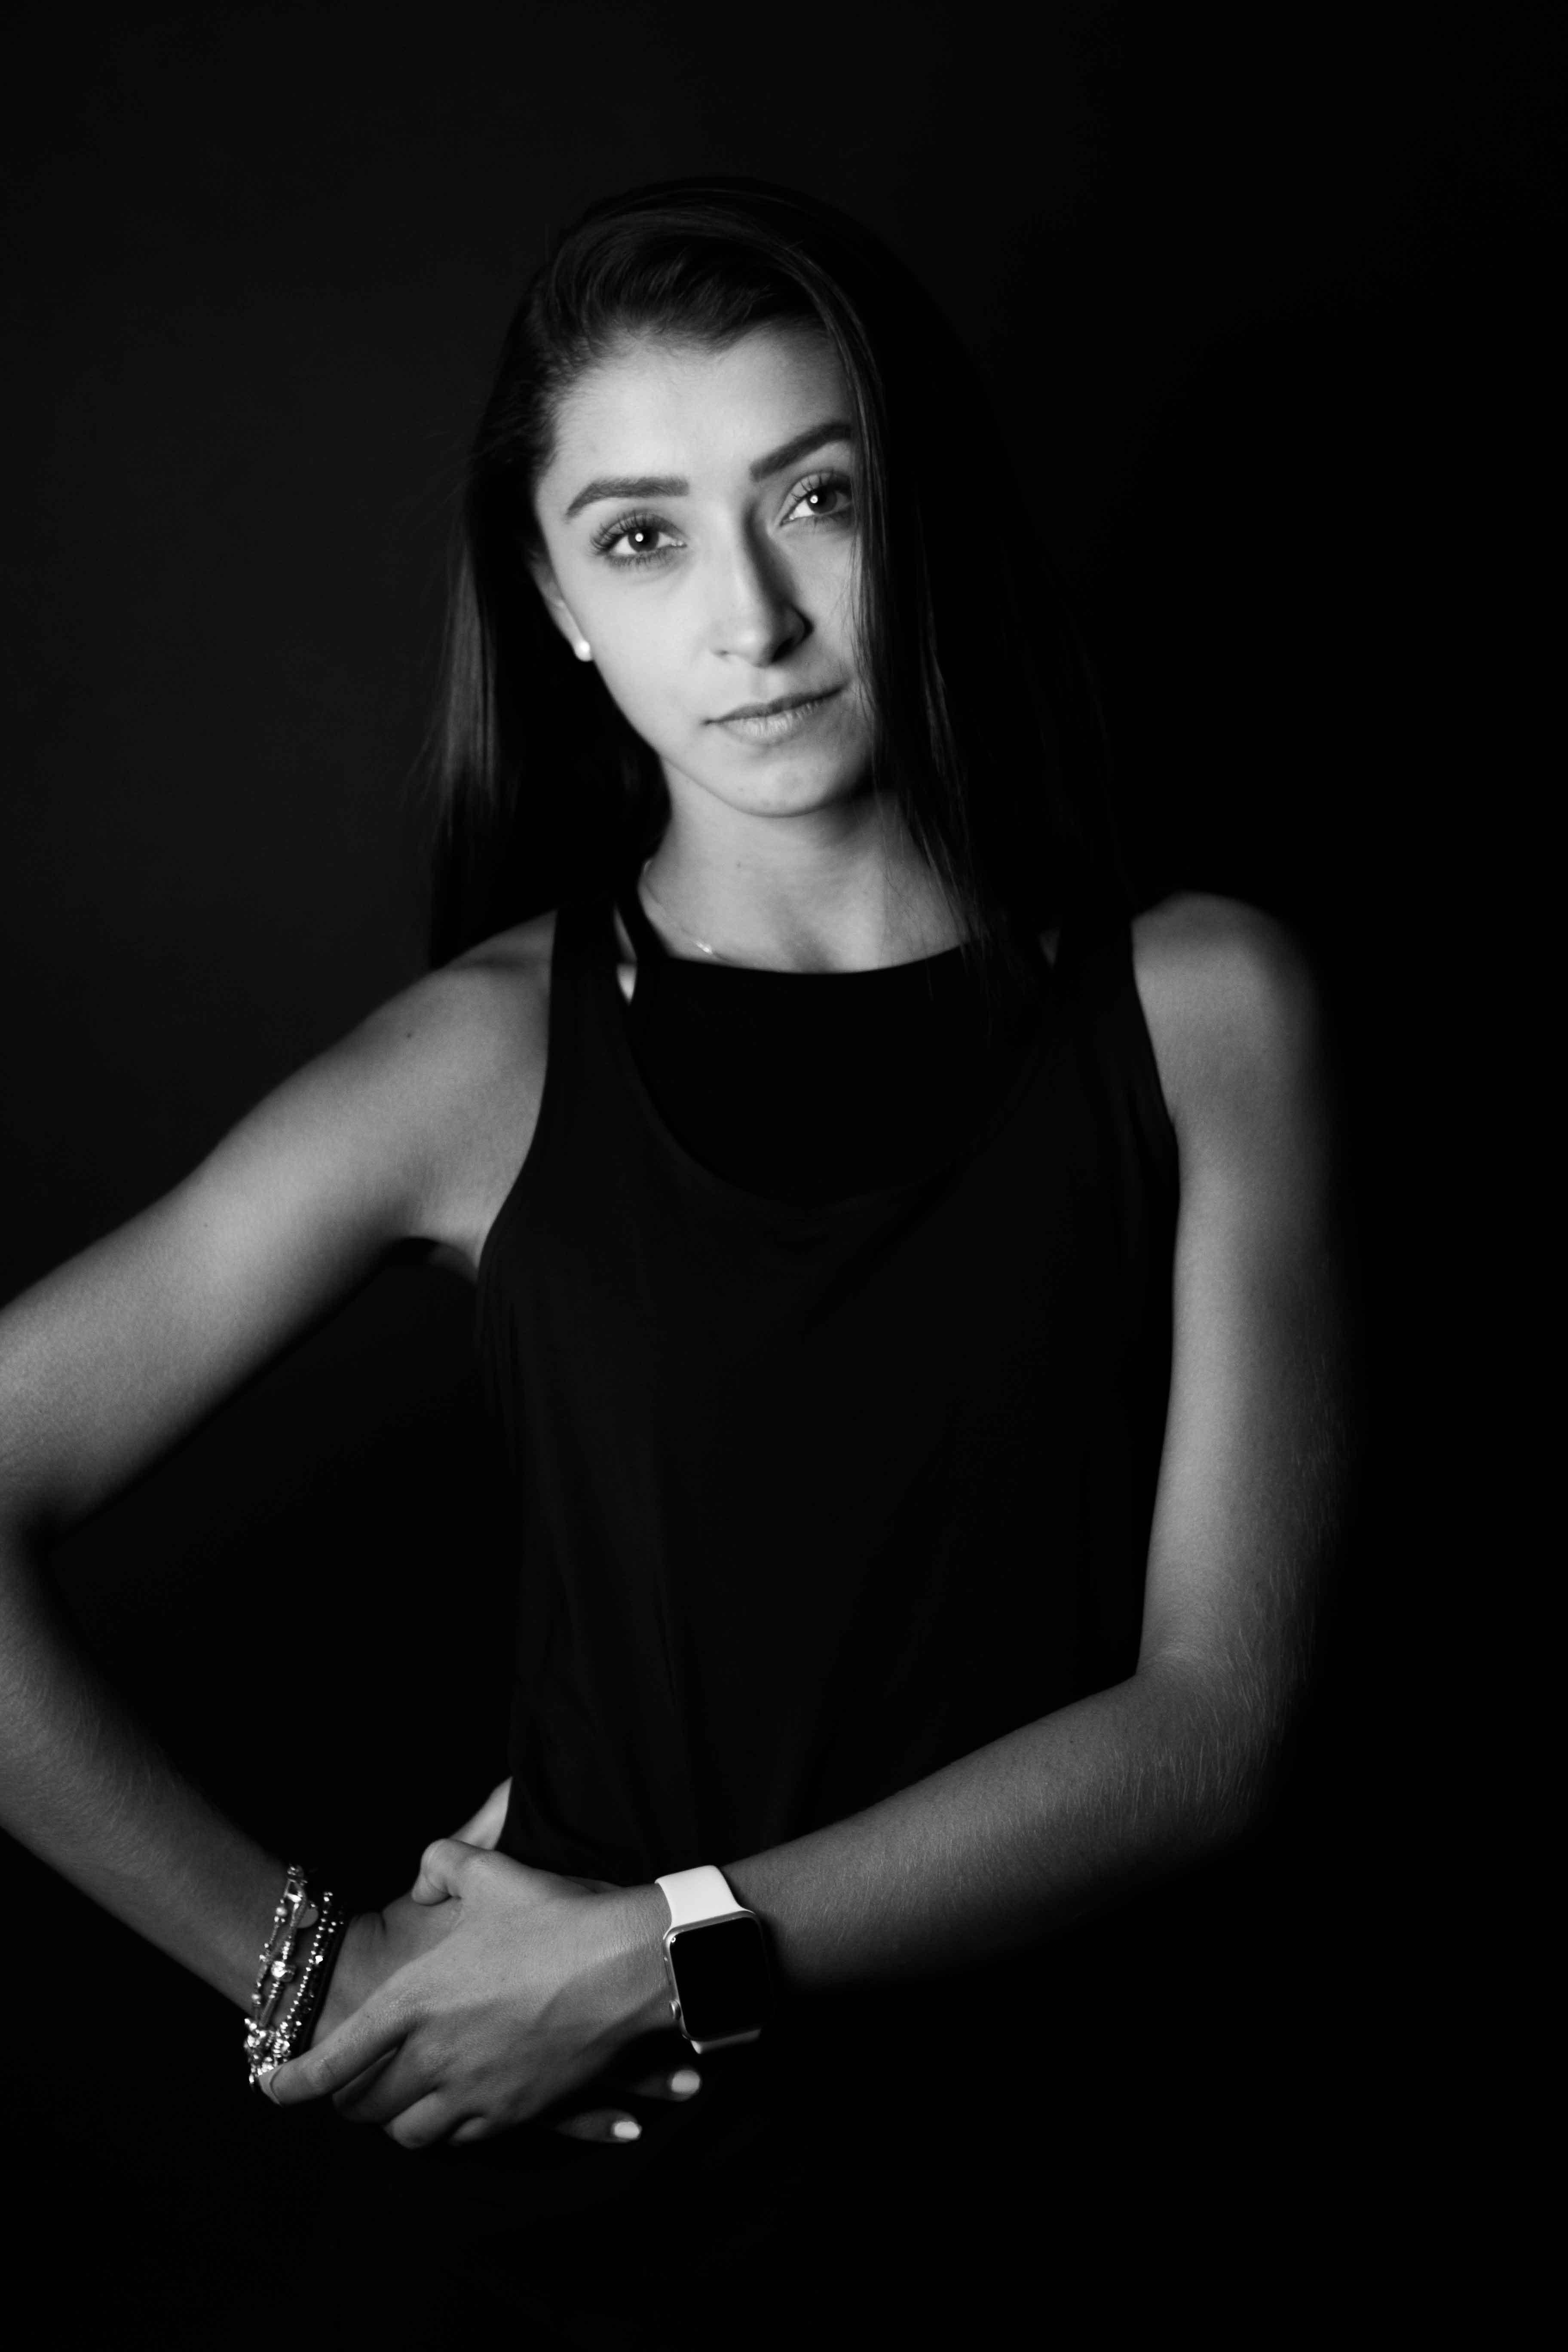 Pamela Girault Contreras